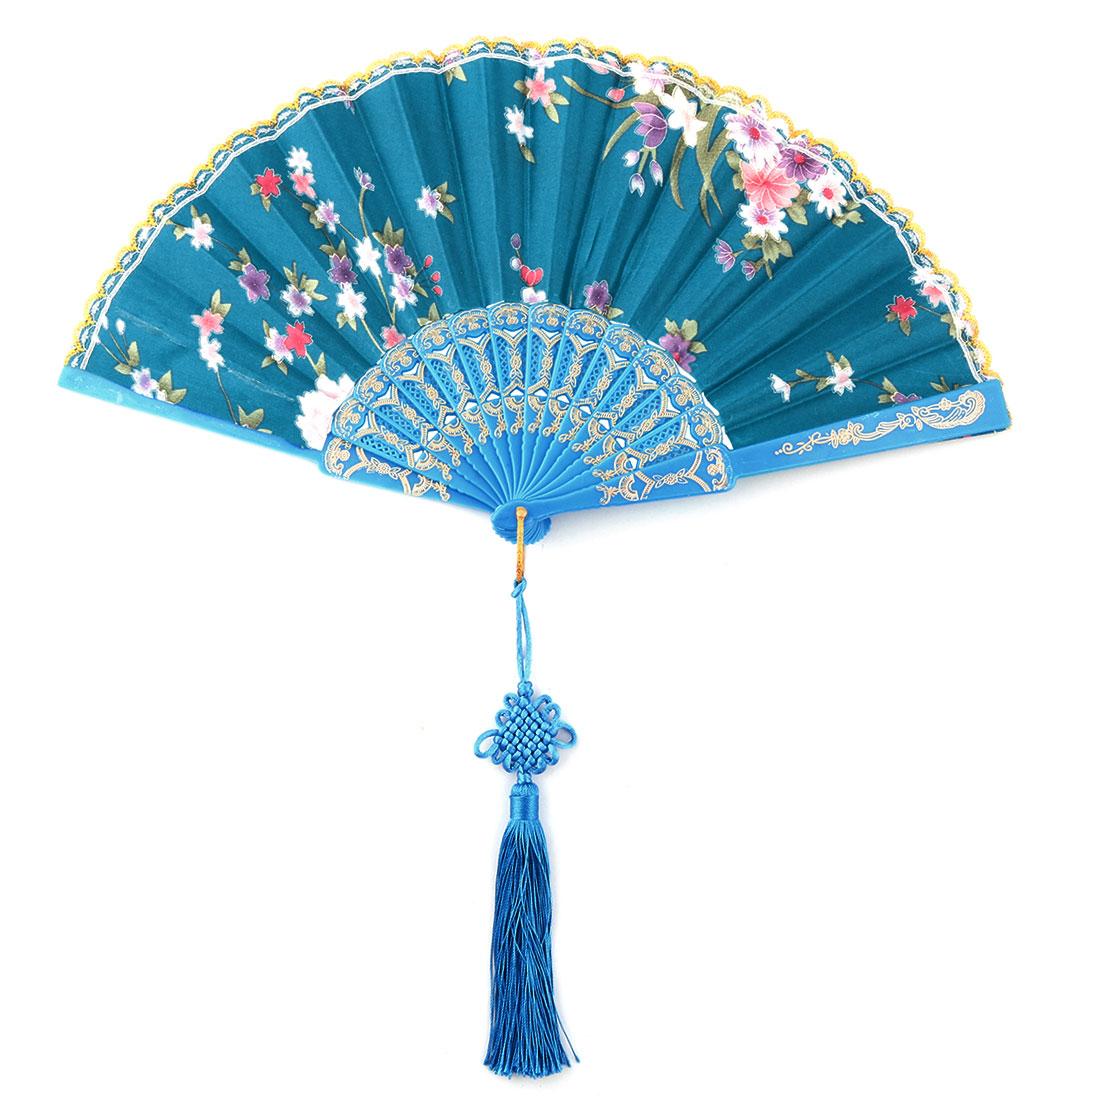 Plastic Frame Flower Pattern Tassel Decor Folding Cooling Dancing Hand Fan Teal Blue